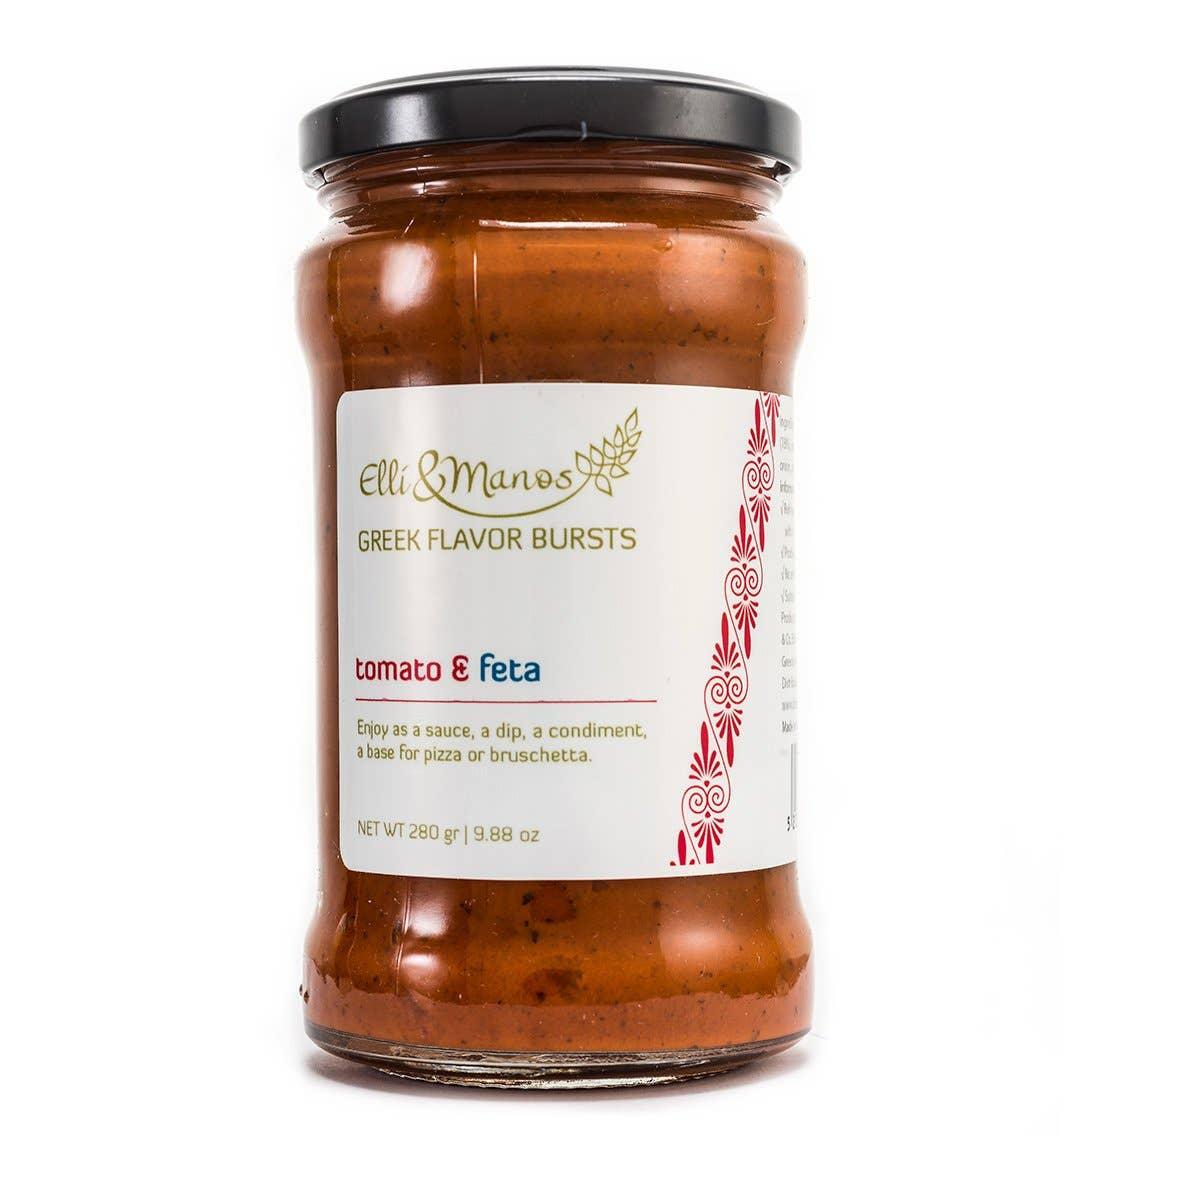 Elli & Manos - Tomato & Feta, All-Natural Spread/Dip | Trada Marketplace